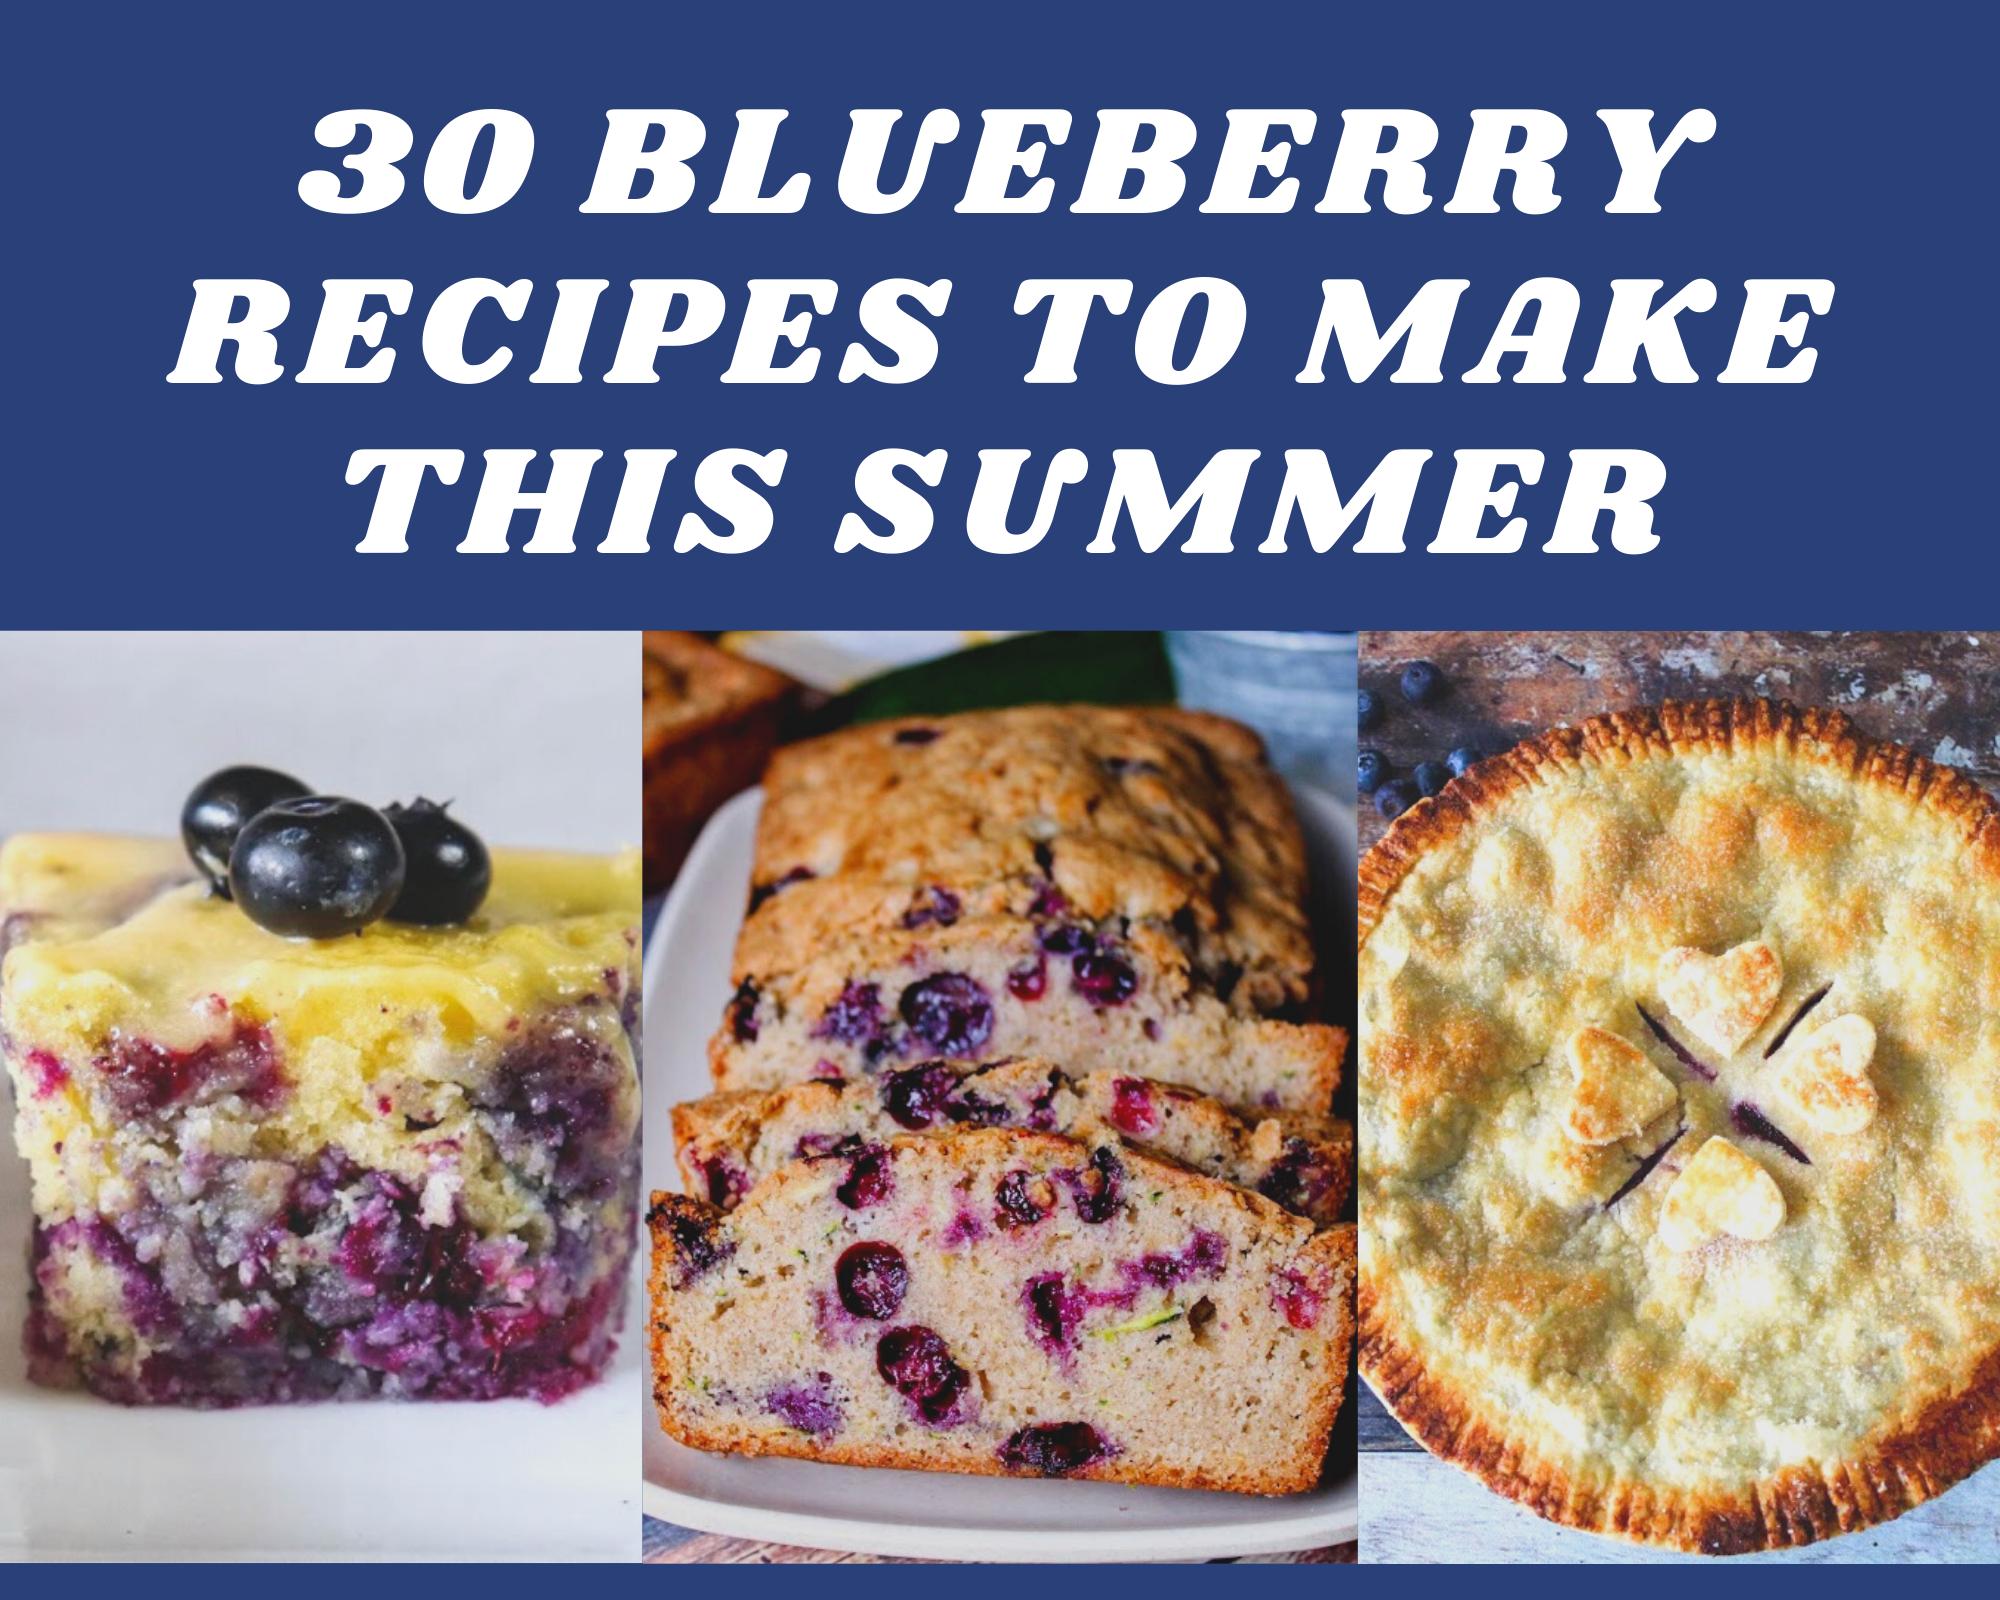 30 blueberry recipes